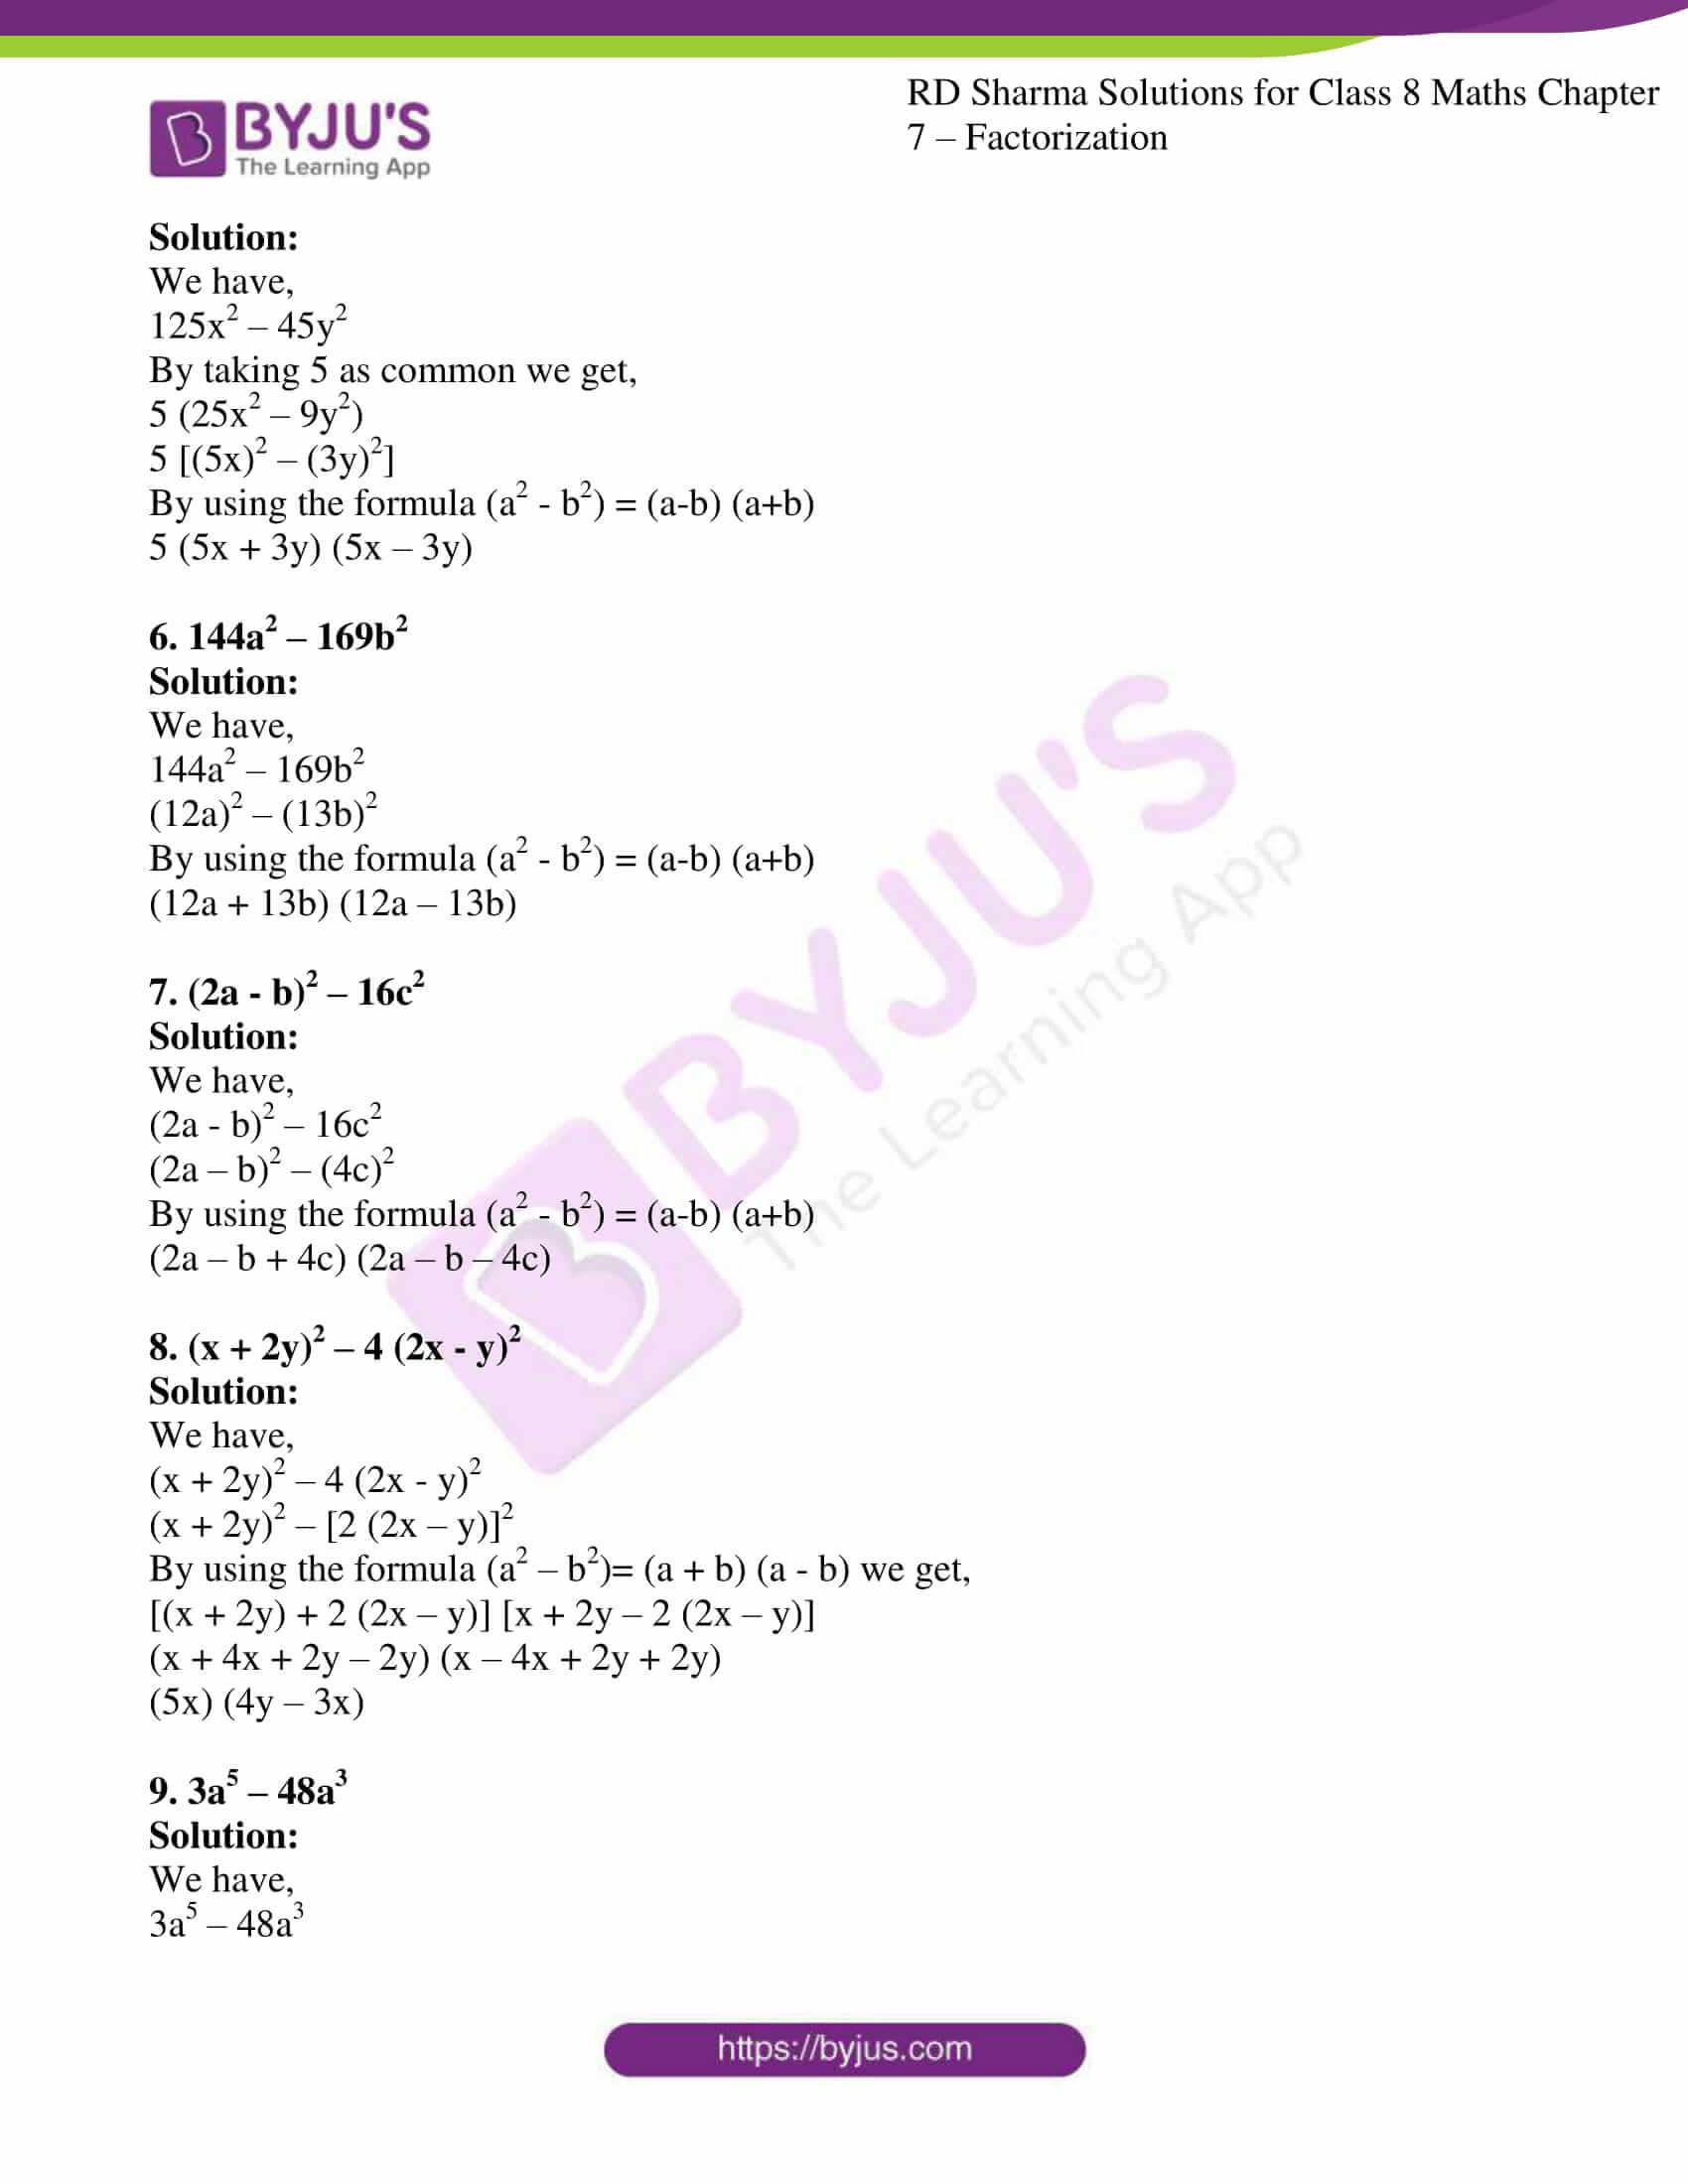 rd sharma class 8 maths chapter 7 exercise 5 02